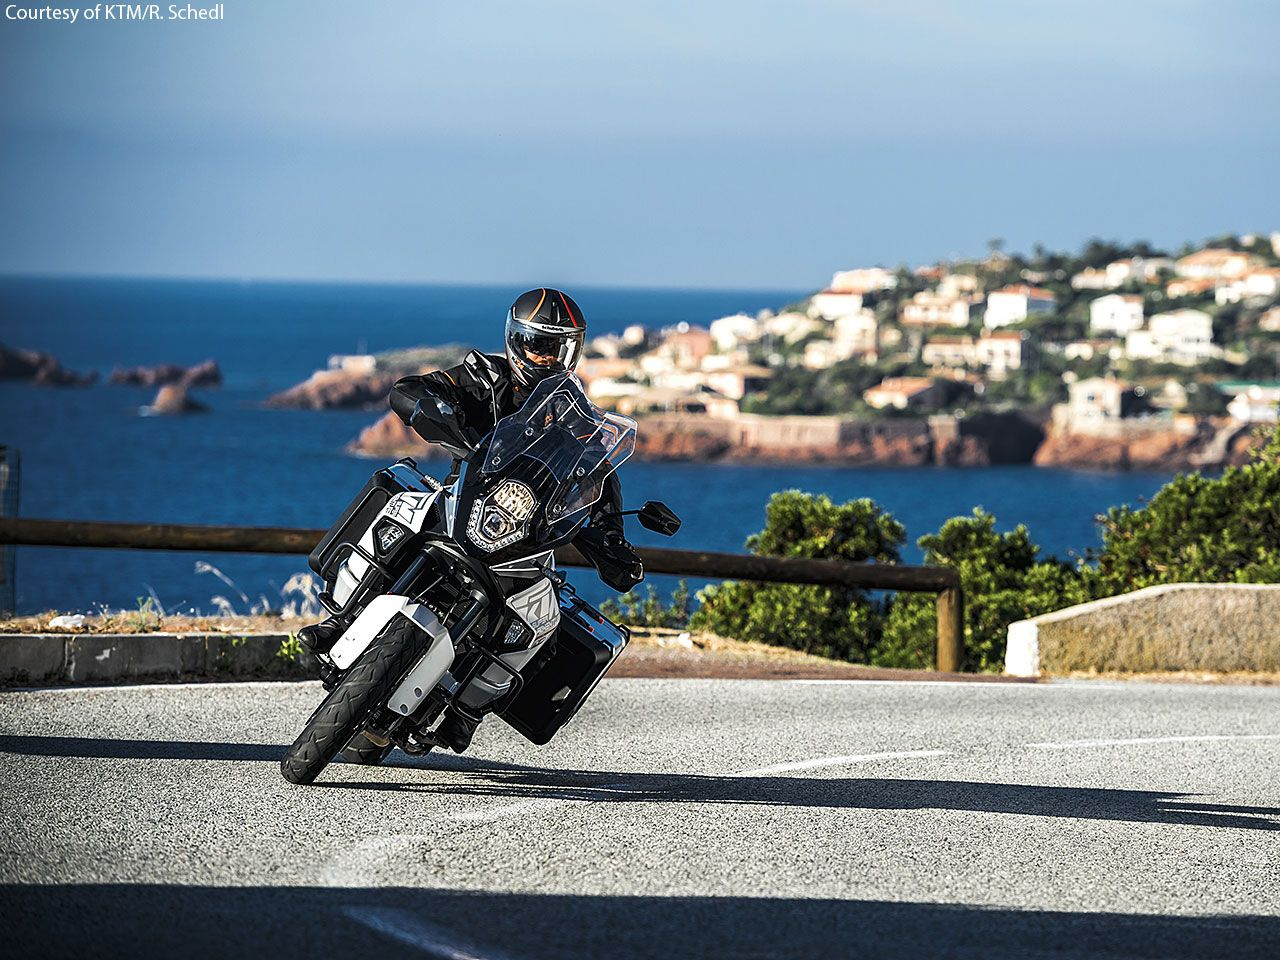 2015 KTM 1290 Super Adventure First Look - Motorcycle USA | My Trip ...